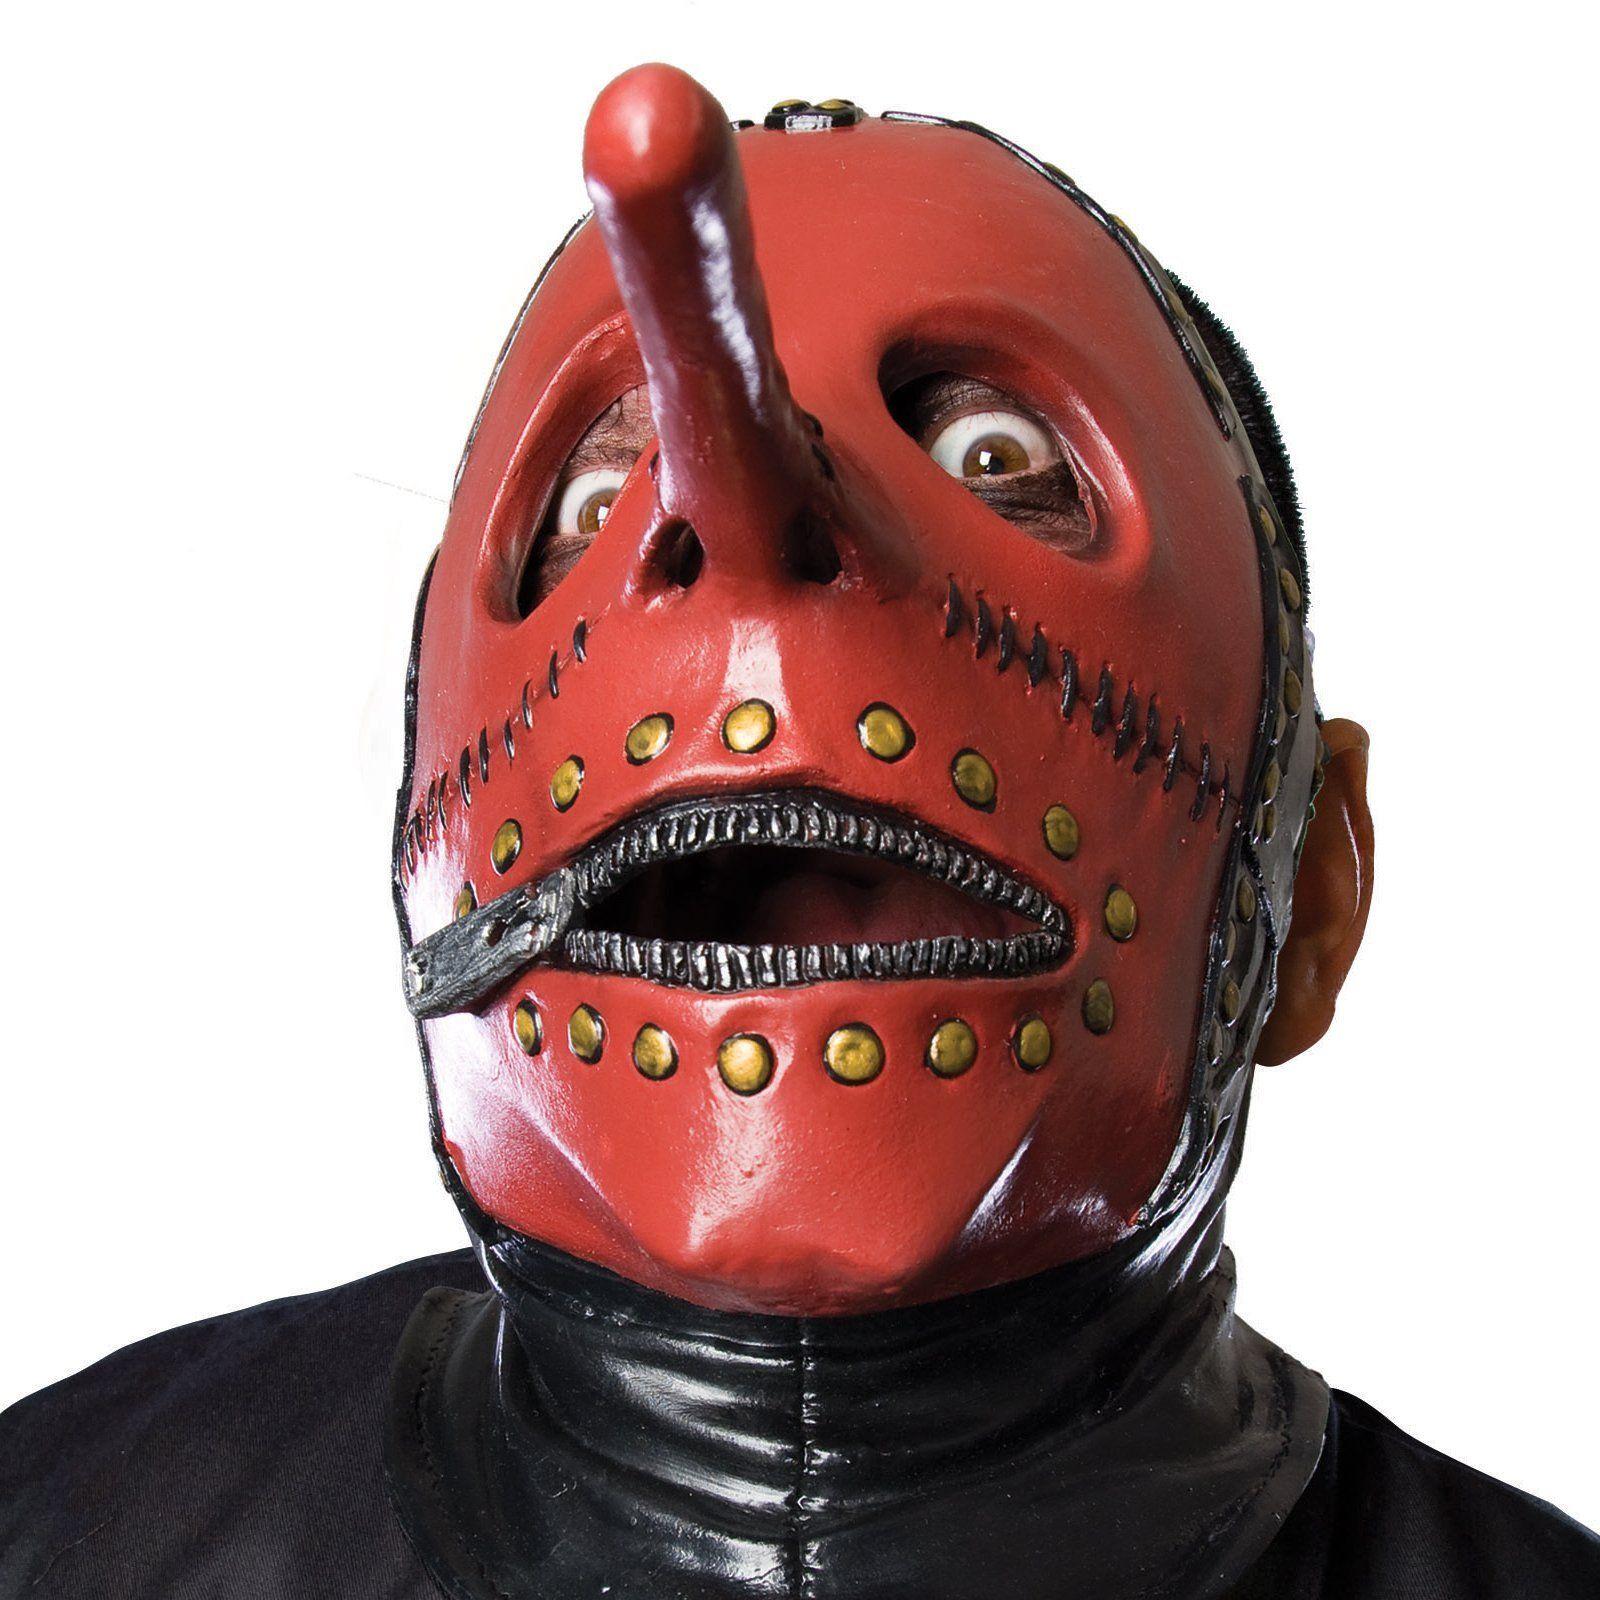 Slipknot Chris Mask #3 Mr. Picklenose Metal Goth Costume Halloween ...